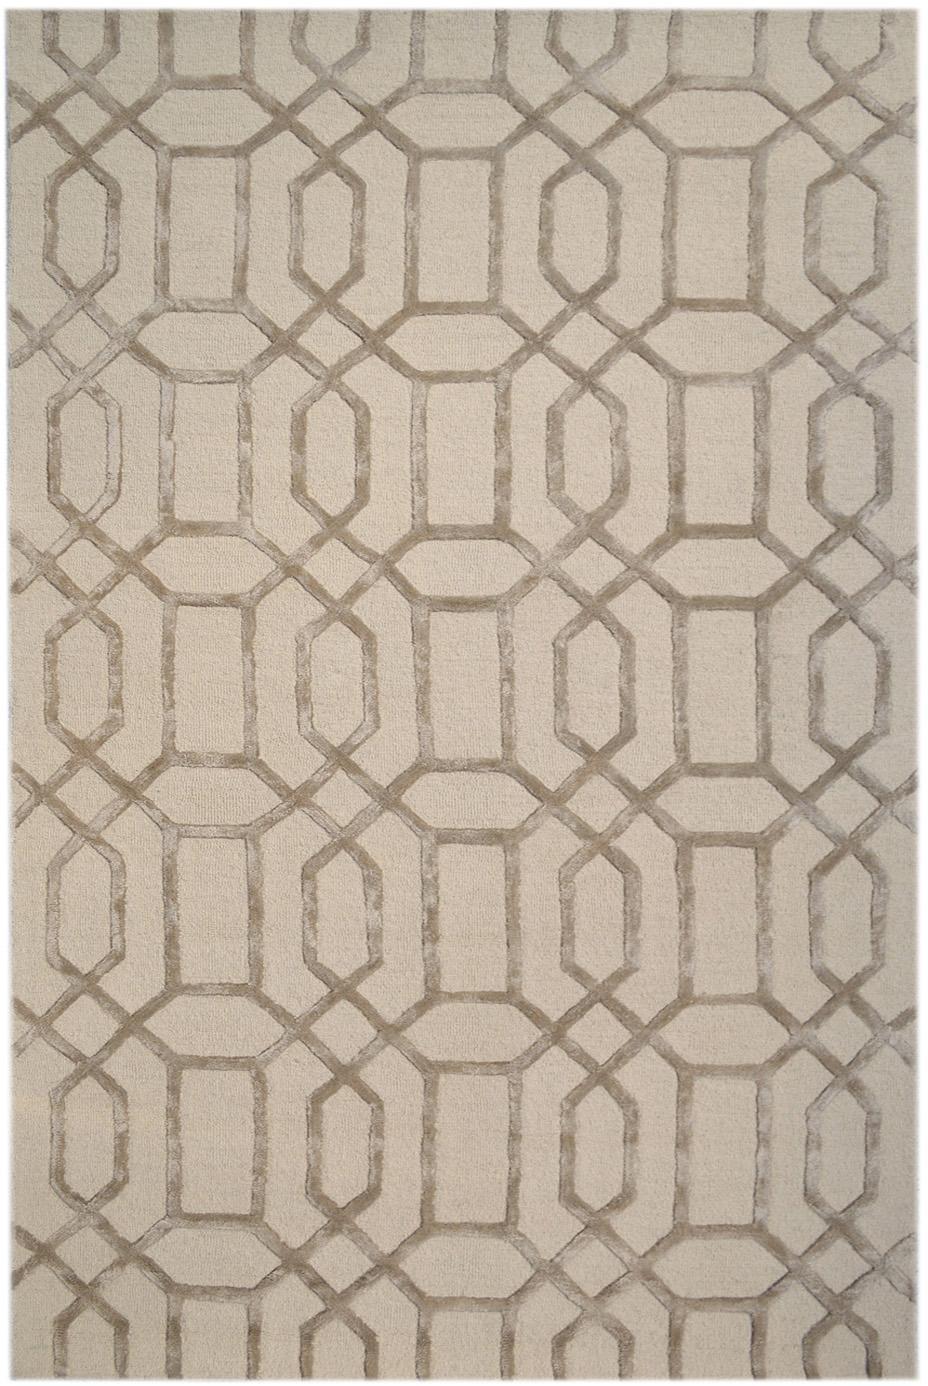 Alfombra artesanal de lana Vegas, Parte superior: 80%lana, 20%viscosa, Reverso: algodón, Beige, crema, An 120 x L 185  cm(Tamaño S)